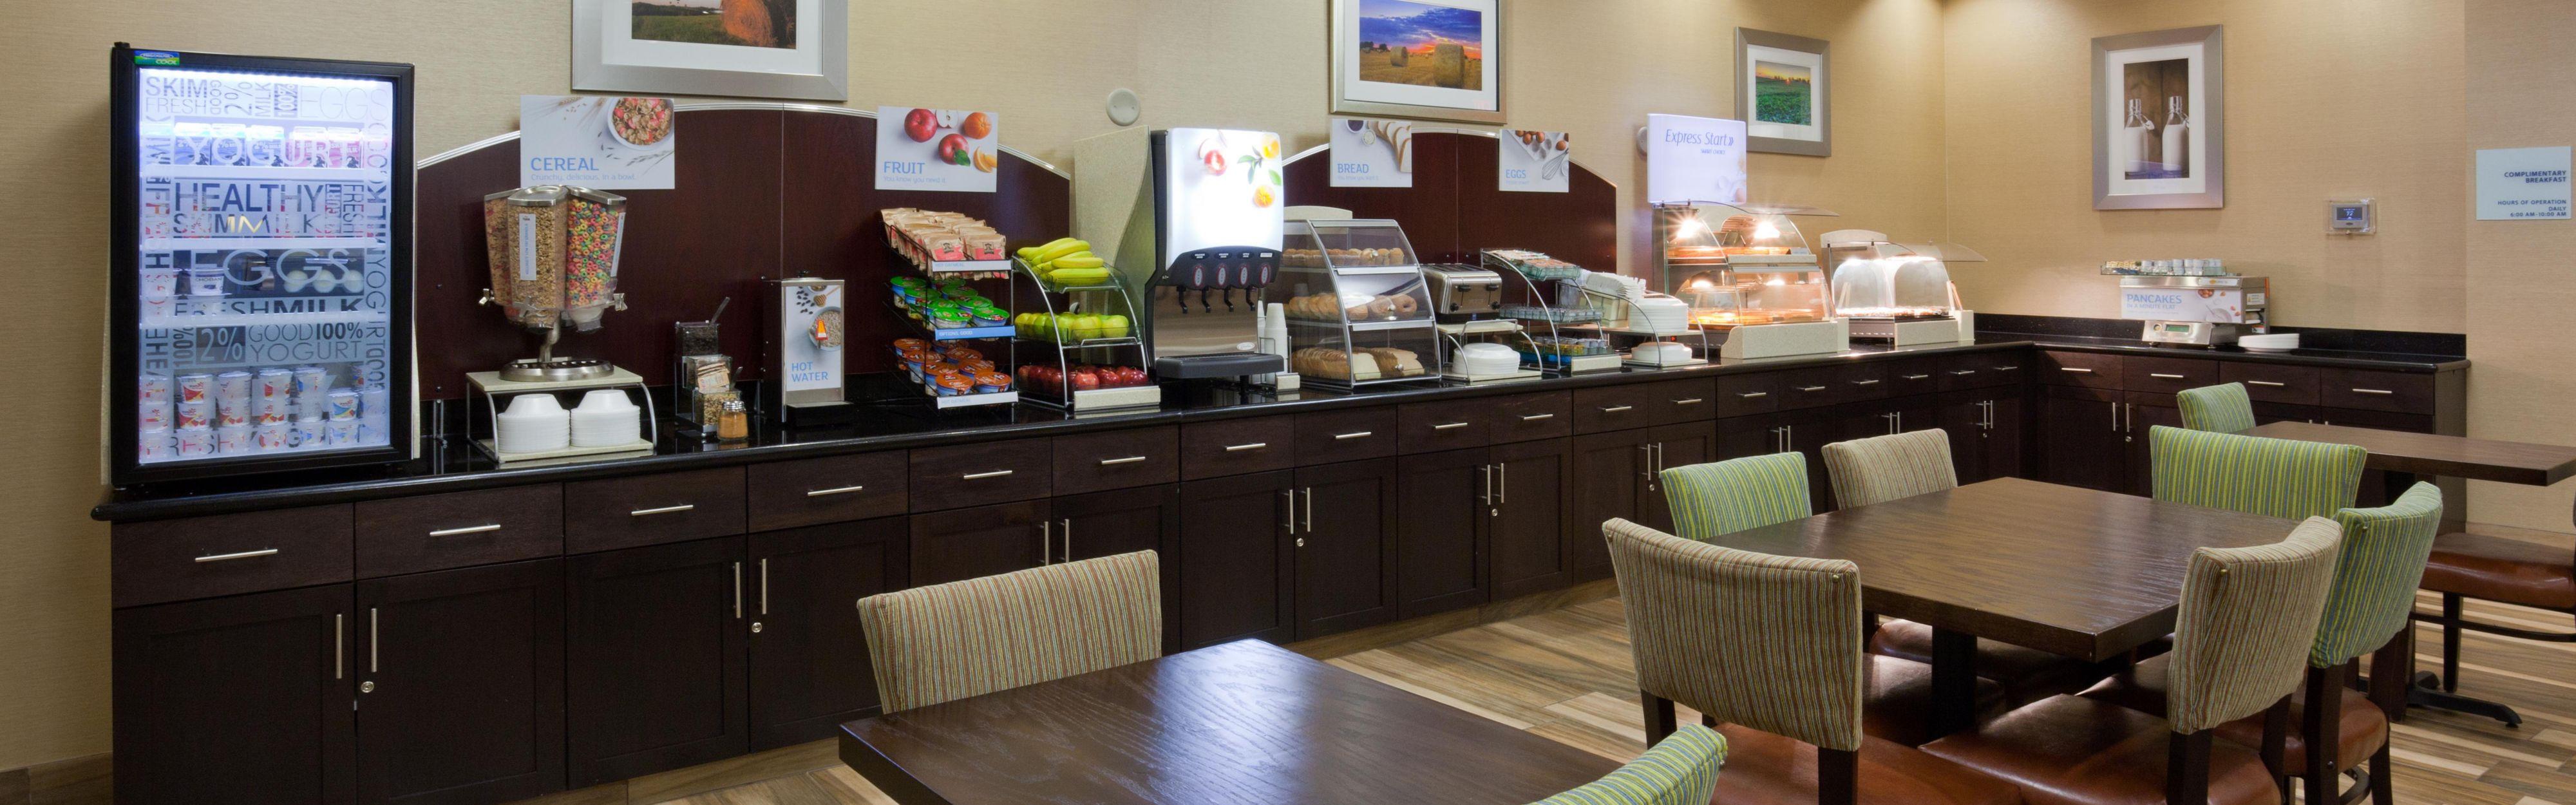 Holiday Inn Express & Suites Fort Dodge image 3